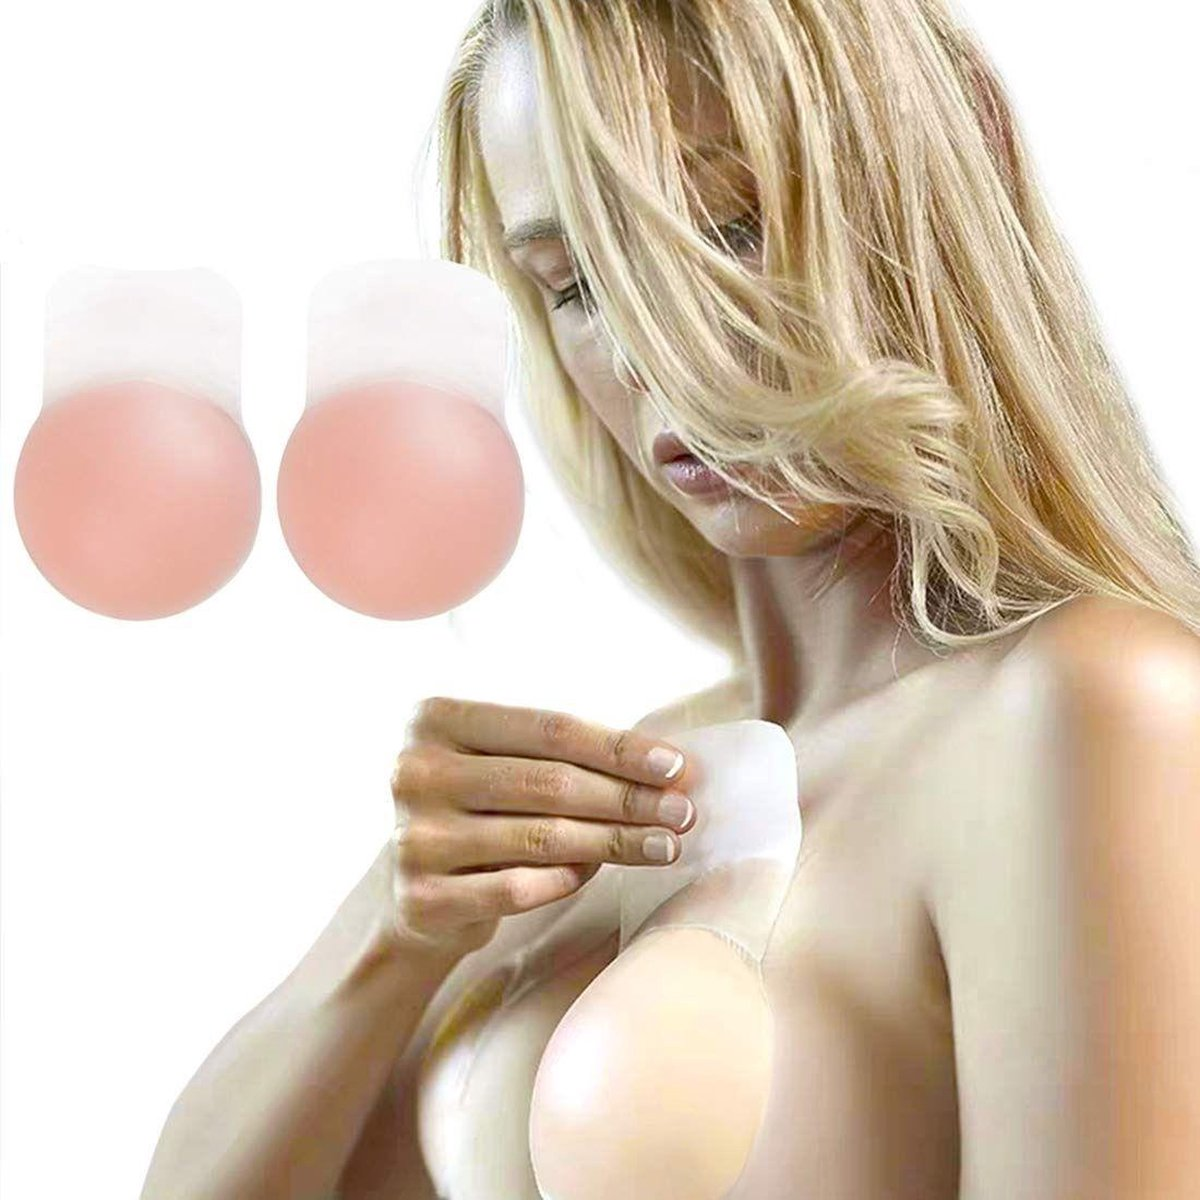 Phannie Zelfklevende Push-Up Tepelbedekkers Siliconen - Hoge Kwaliteit -Tepelcovers - Plak BH Push U